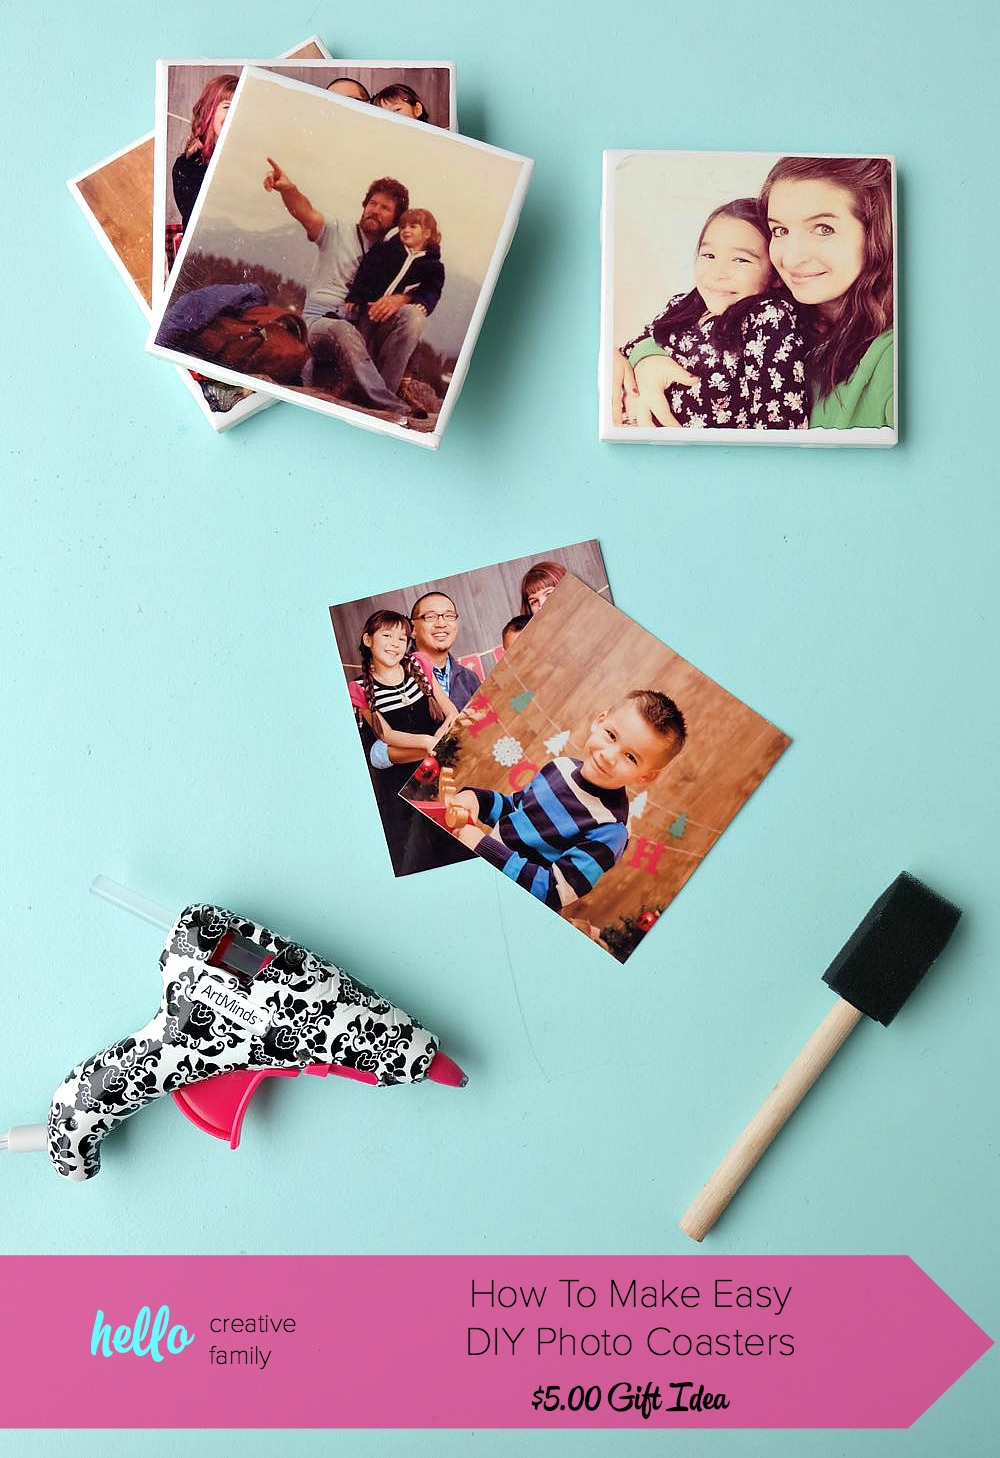 50 Easy Handmade Gift Ideas You'll Love: Easy DIY Photo Coasters